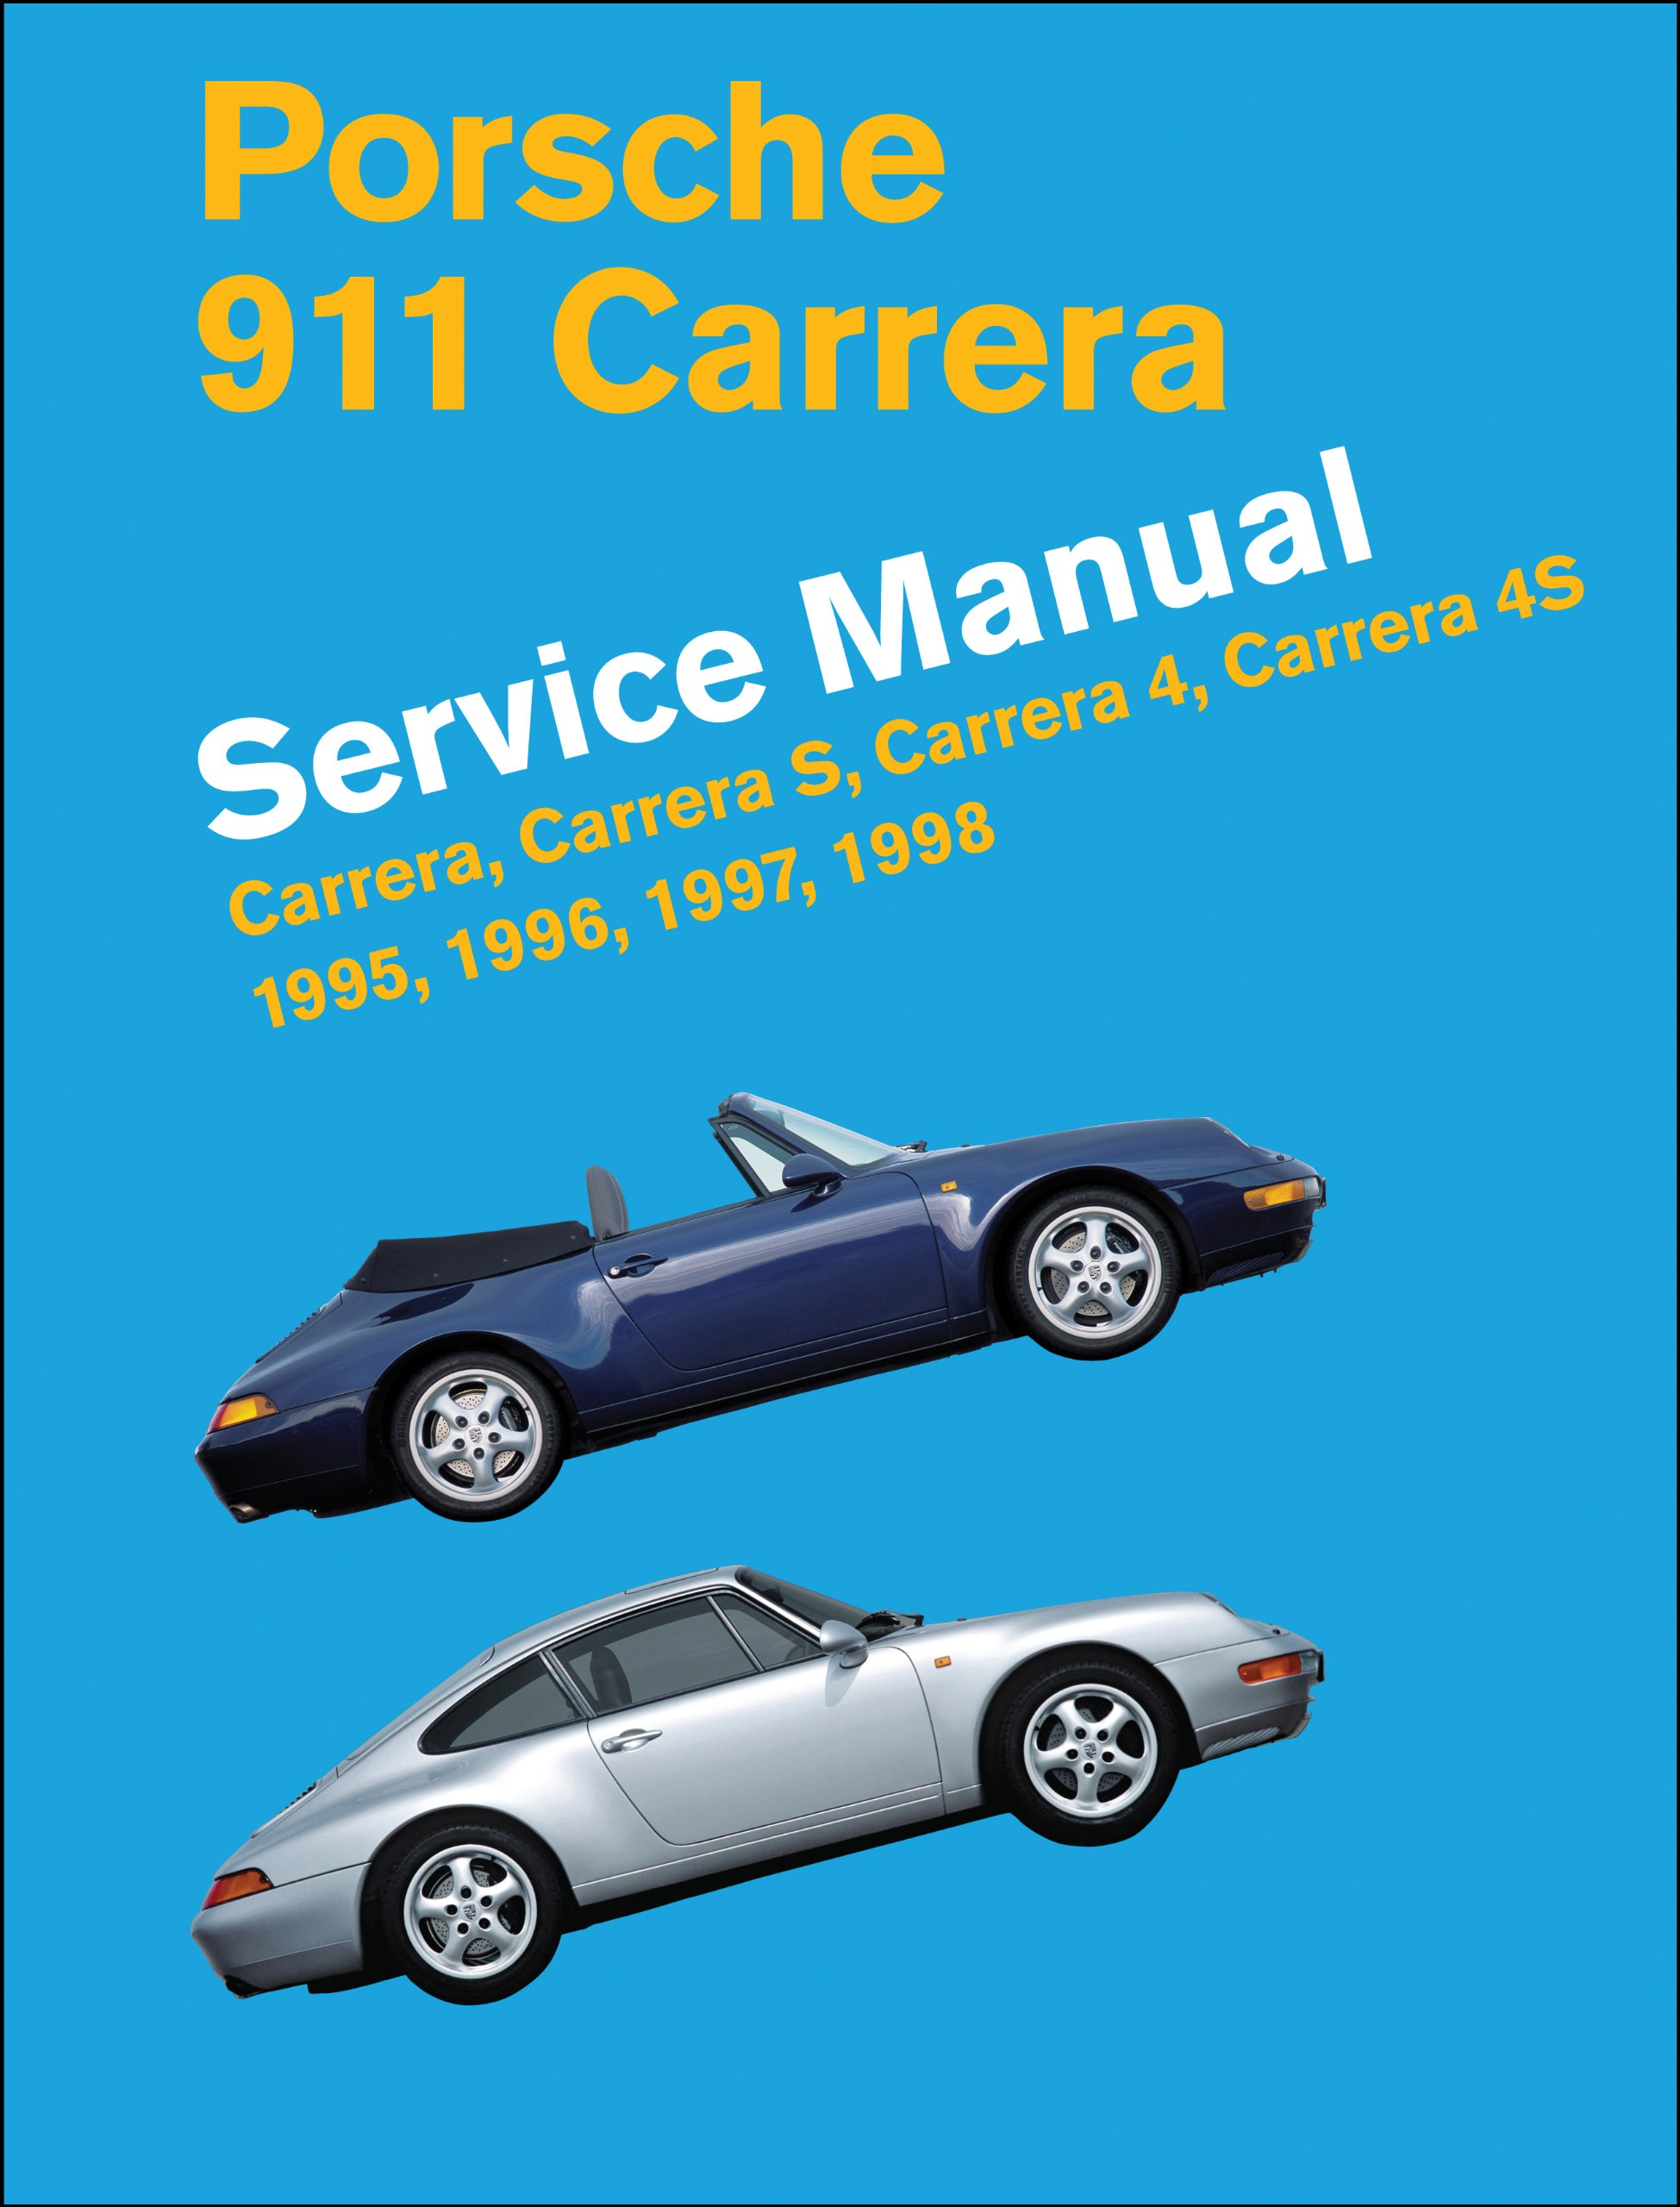 Porsche 911 Carrera (Type 993) Service Manual 1995, 1996, 1997, 1998:  Carrera, Carrera S, Carrera 4, Carrera 4s: Amazon.co.uk: Bentley  Publishers: ...